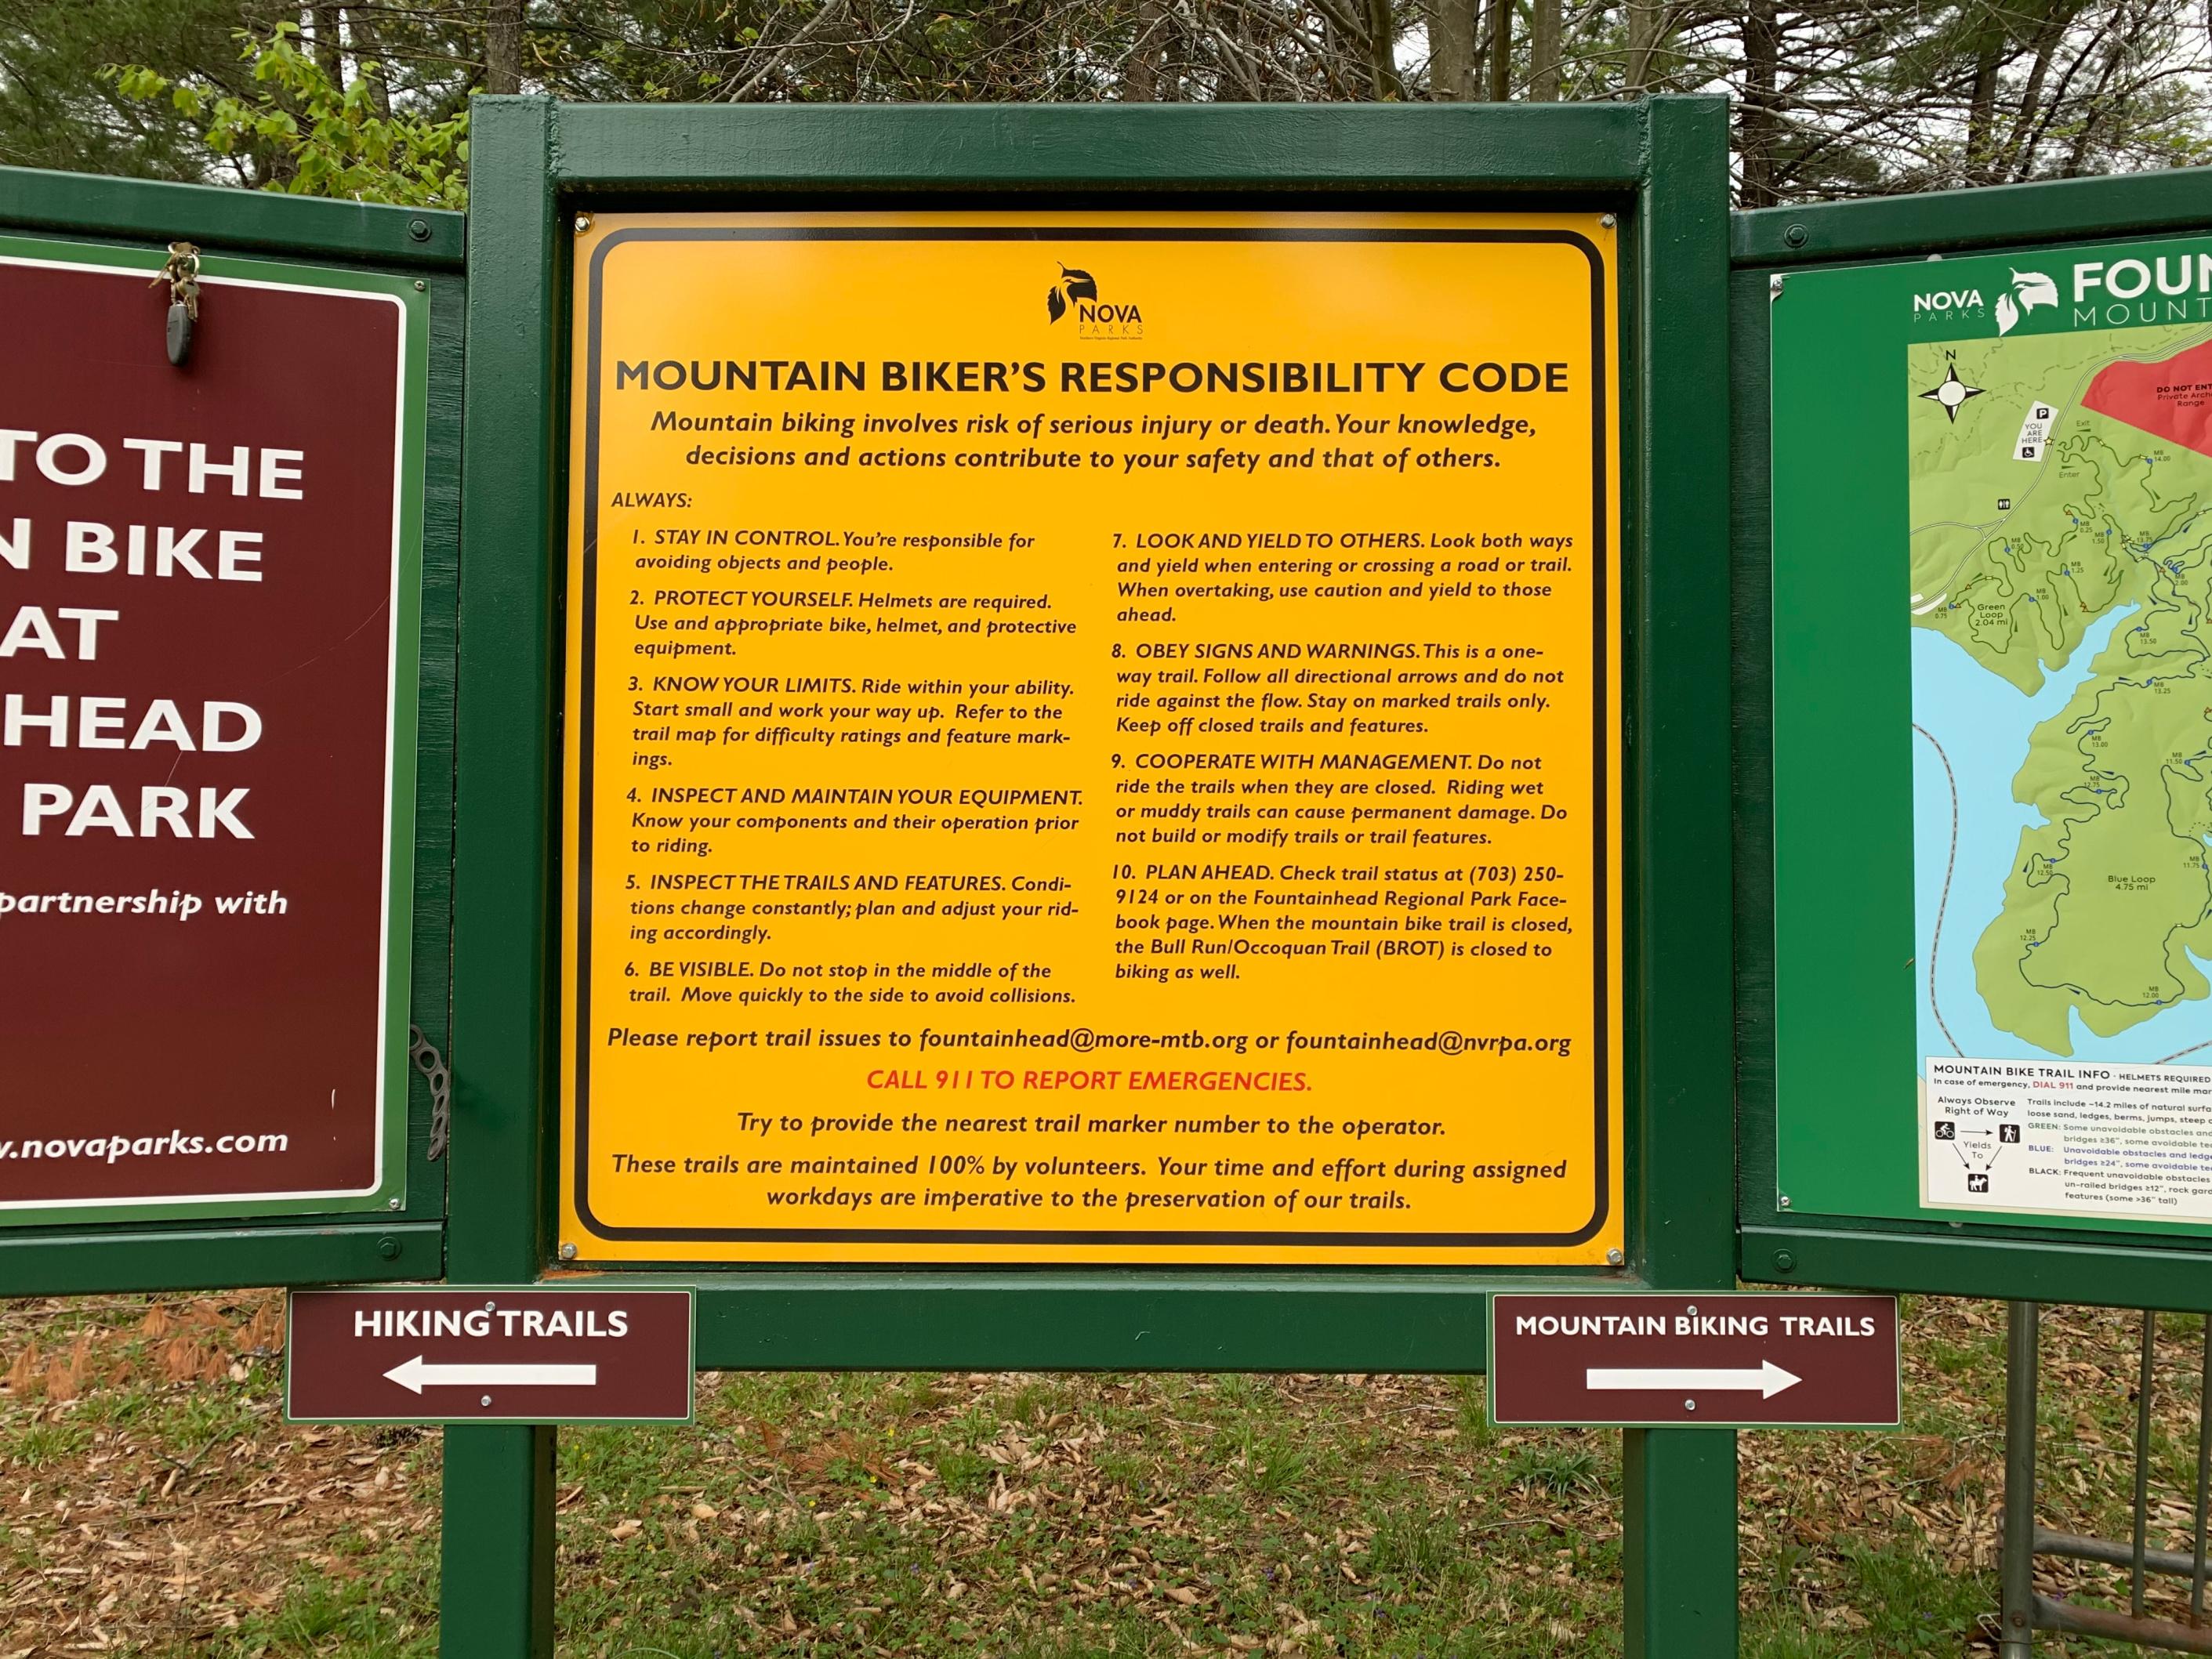 Foutainhead Regional Park_biking trails